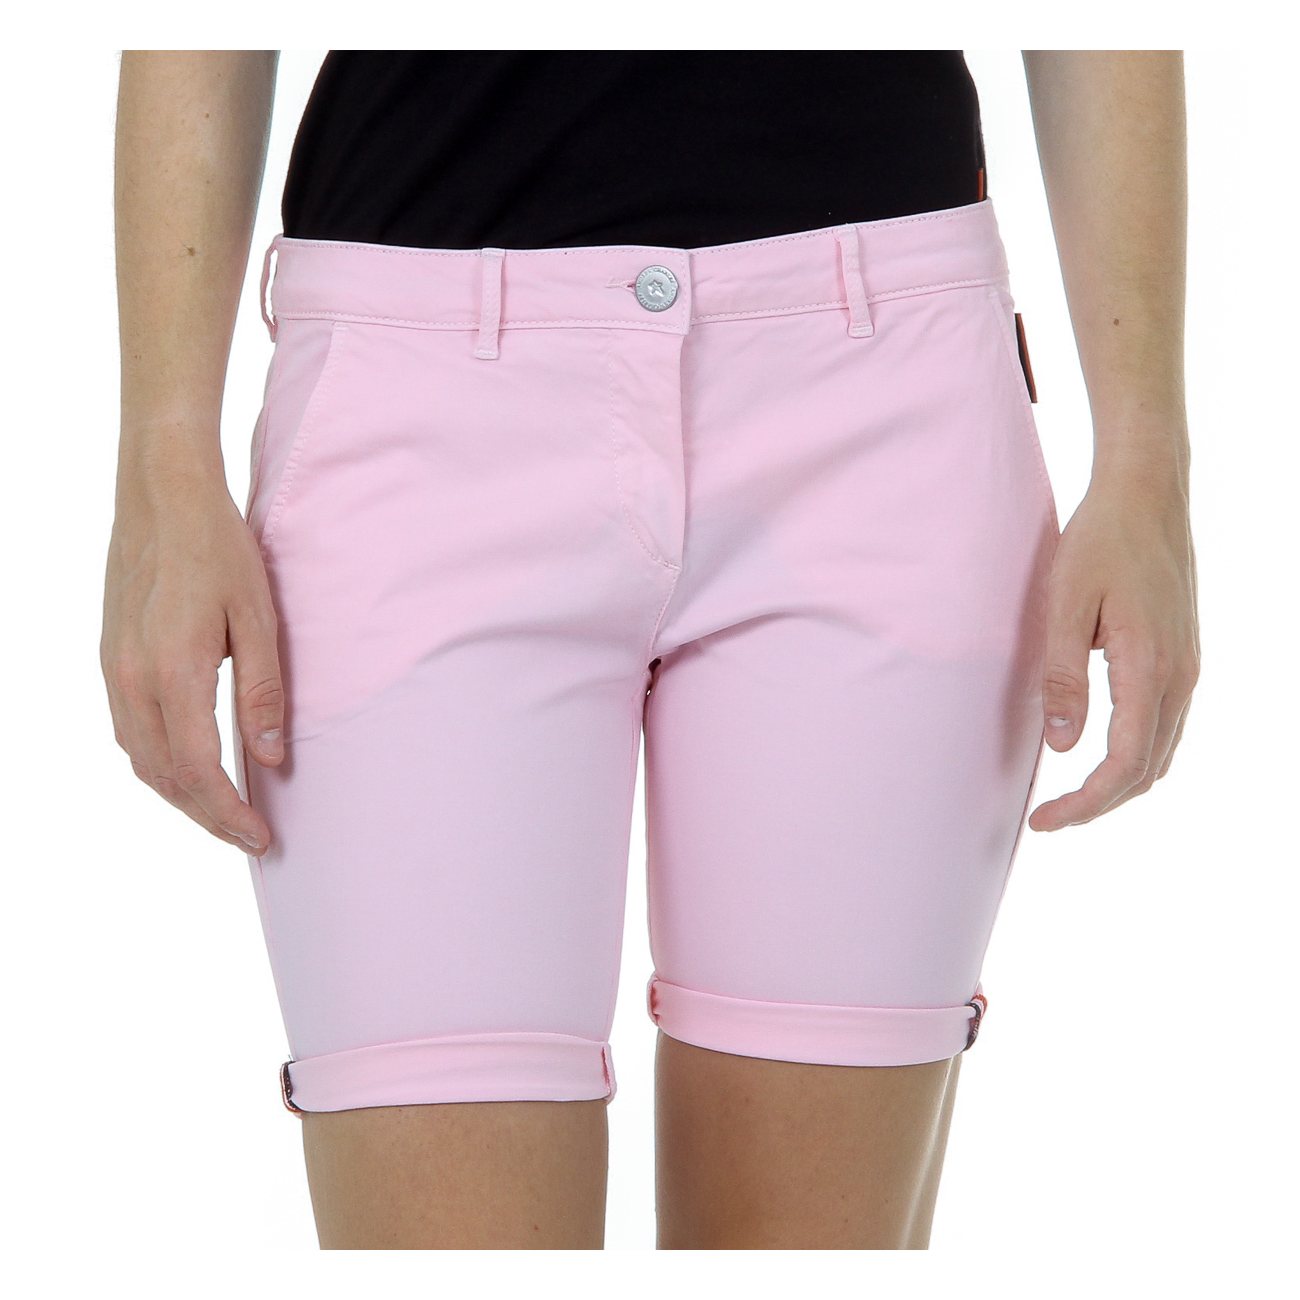 Andrew Charles Womens Shorts Pink SAFIA